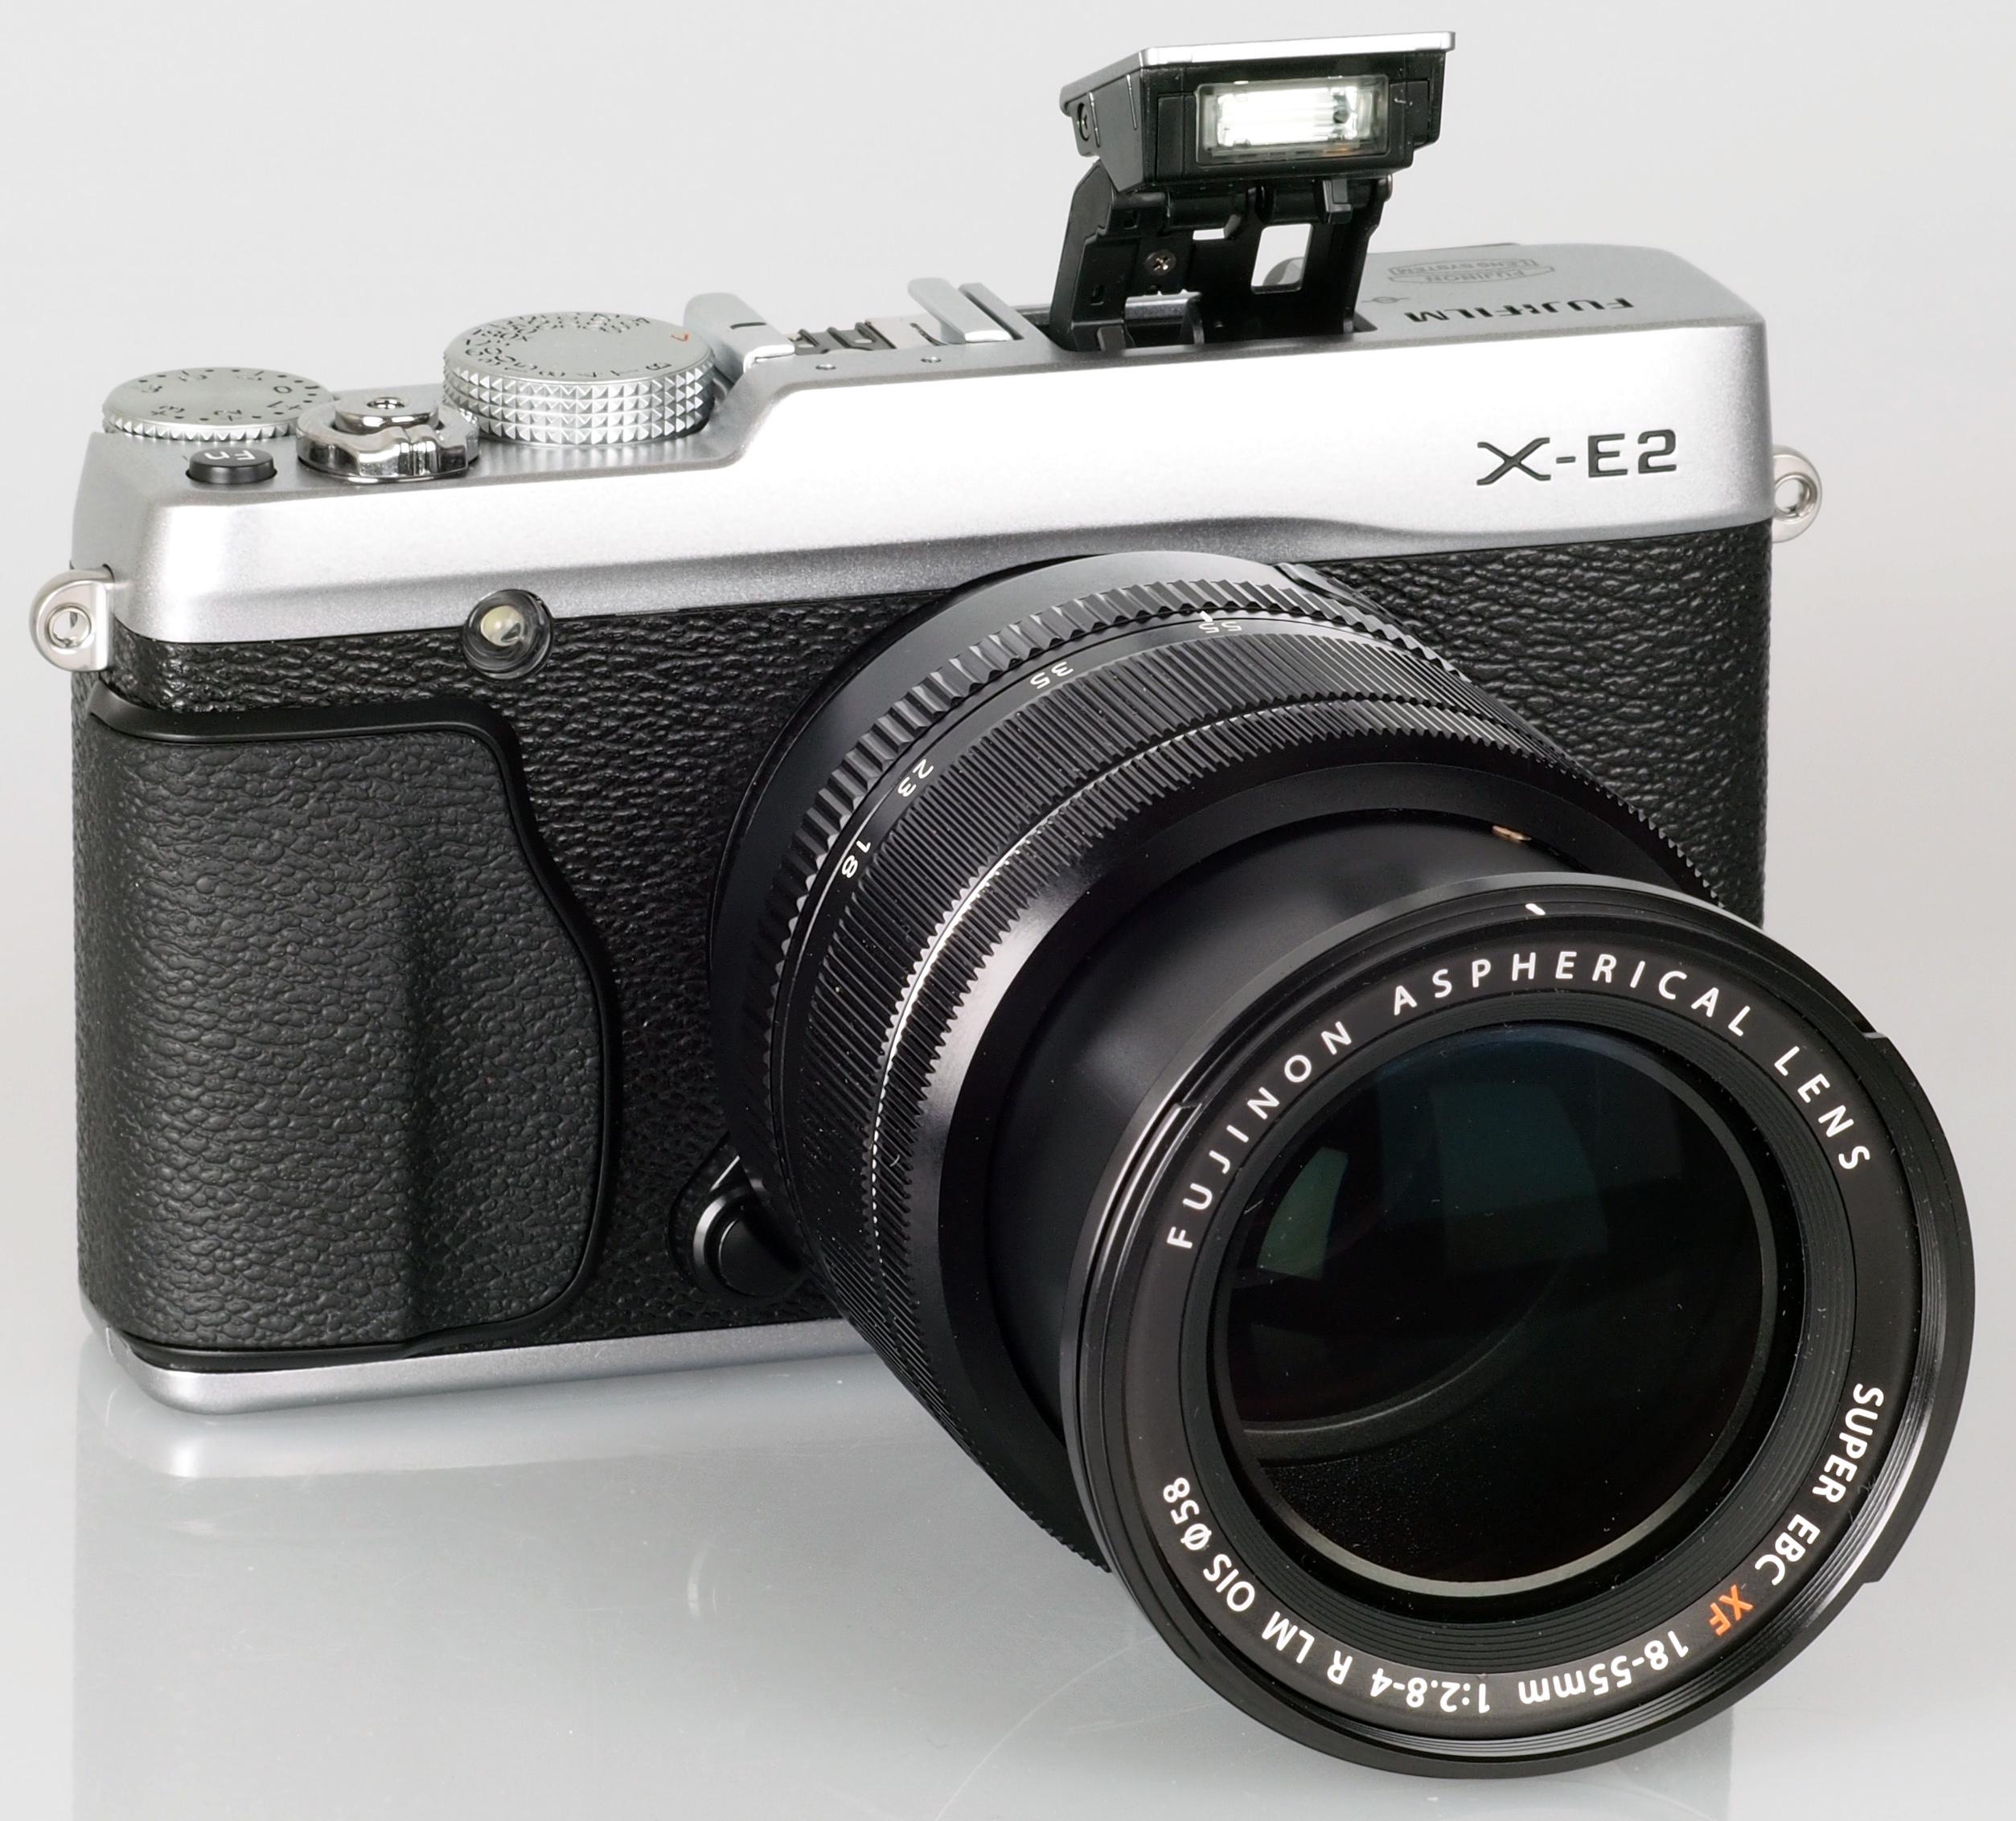 Fujifilm X E2 Review E3 Kit Xf 18 55mm F 28 4 R Lm Ois Silver Body 5